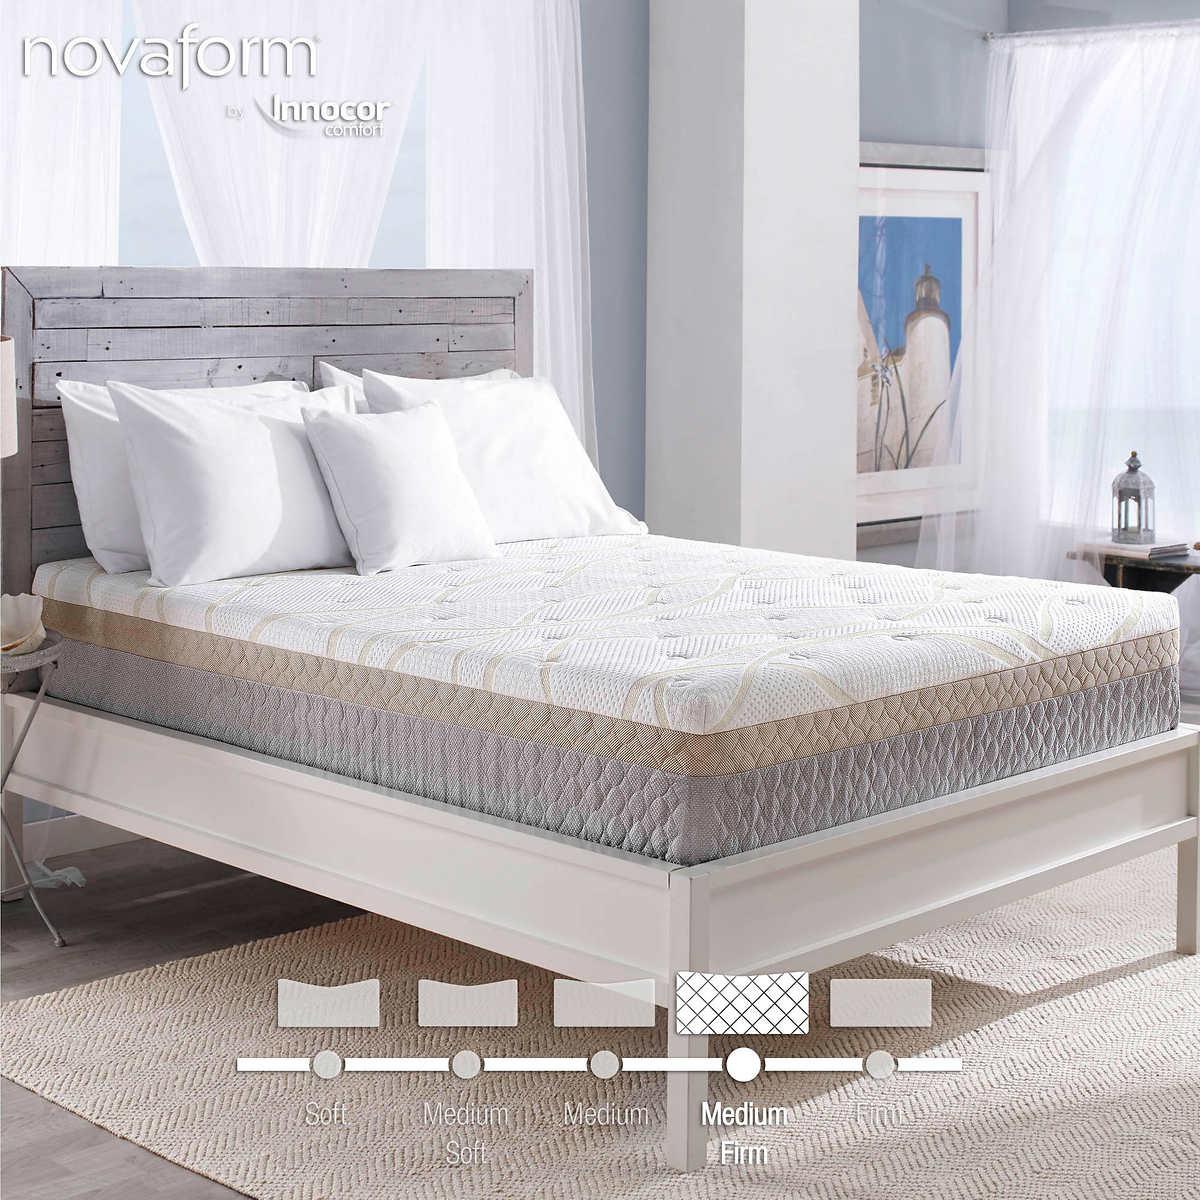 "Novaform 12"" Bella Venta Cal King Gel Memory Foam Mattress"